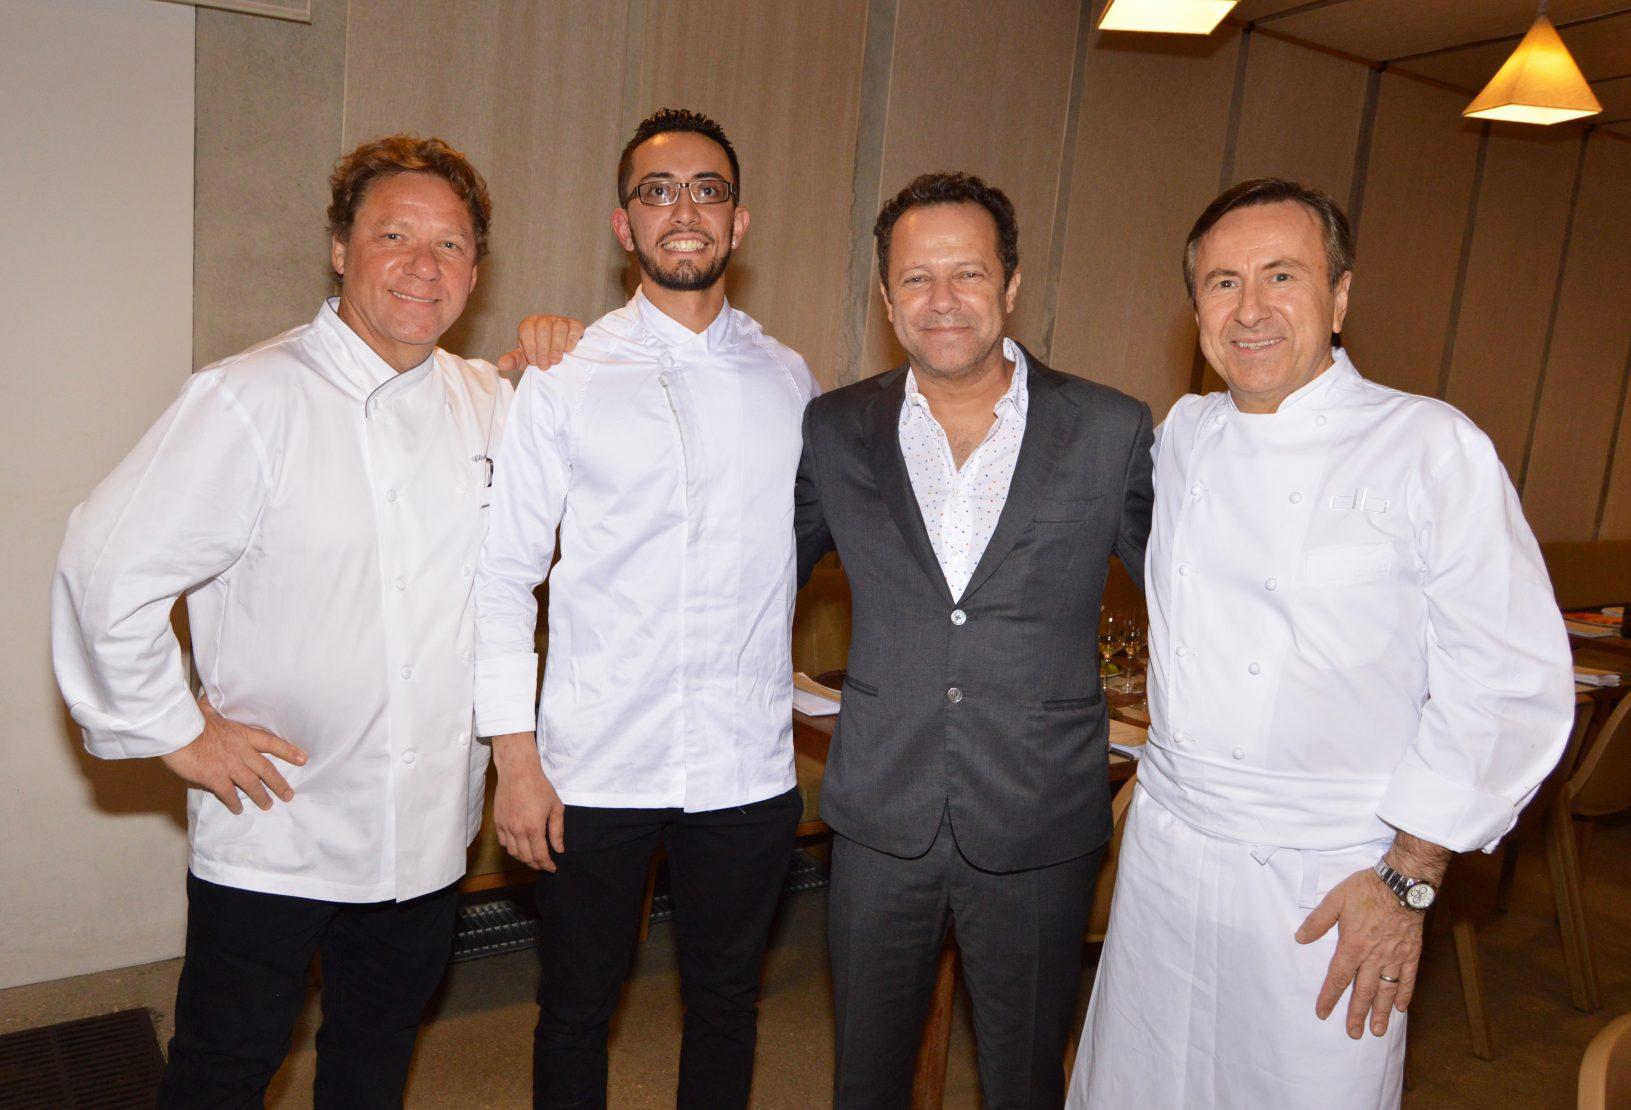 Claude Troisgros, Freddie Martinez, Vik Muniz and Daniel Boulud